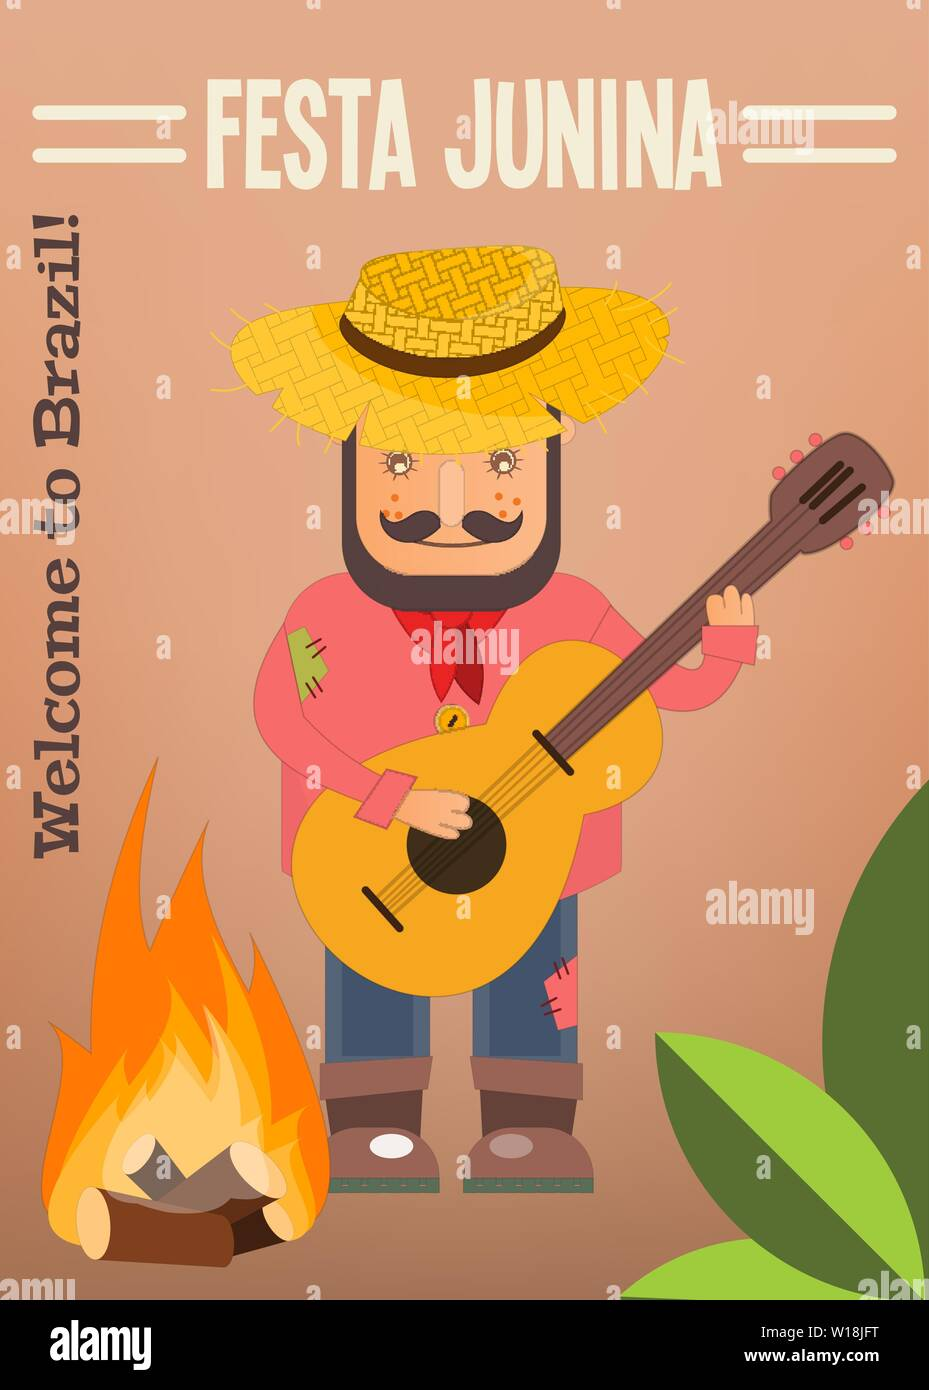 Festa Junina - Brazil June Festival. Poster for Folklore Holiday. Funny  Hick in Straw Hat Plays the Guitar near Bonfire. Vector Illustration. Stock Vector